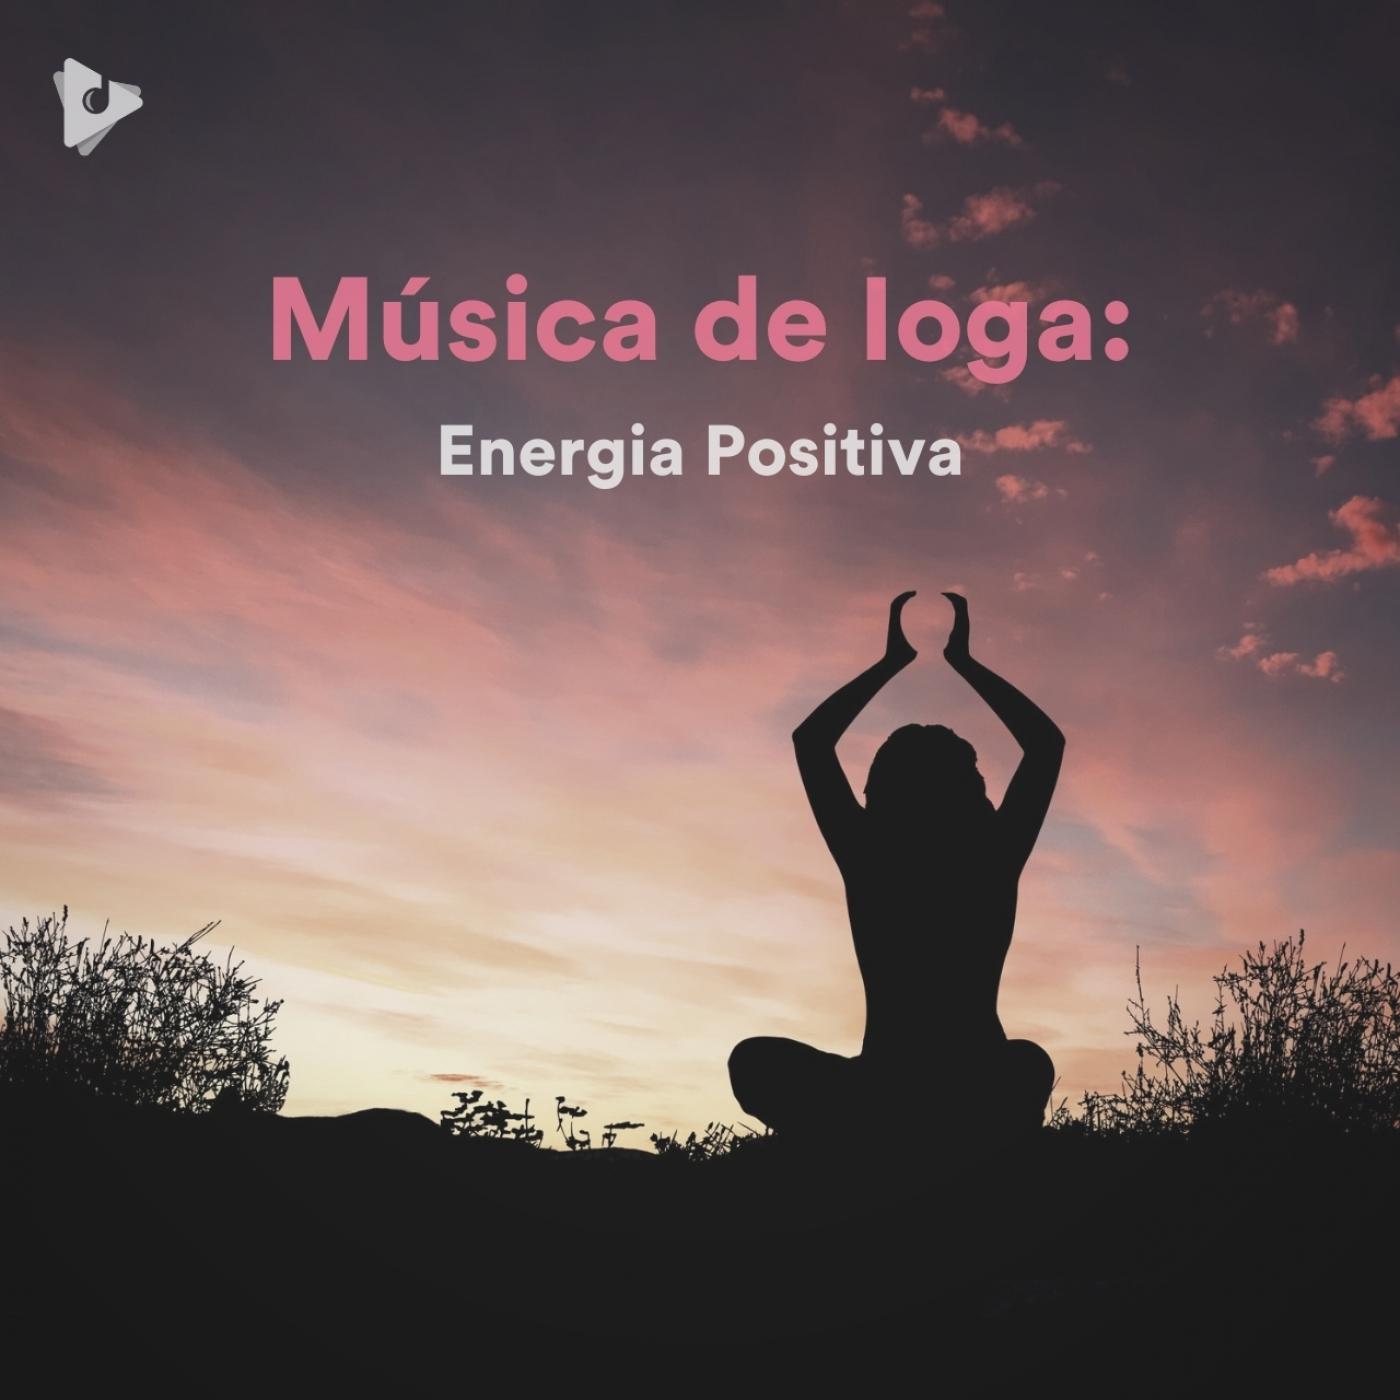 Música de Ioga: Energia Positiva